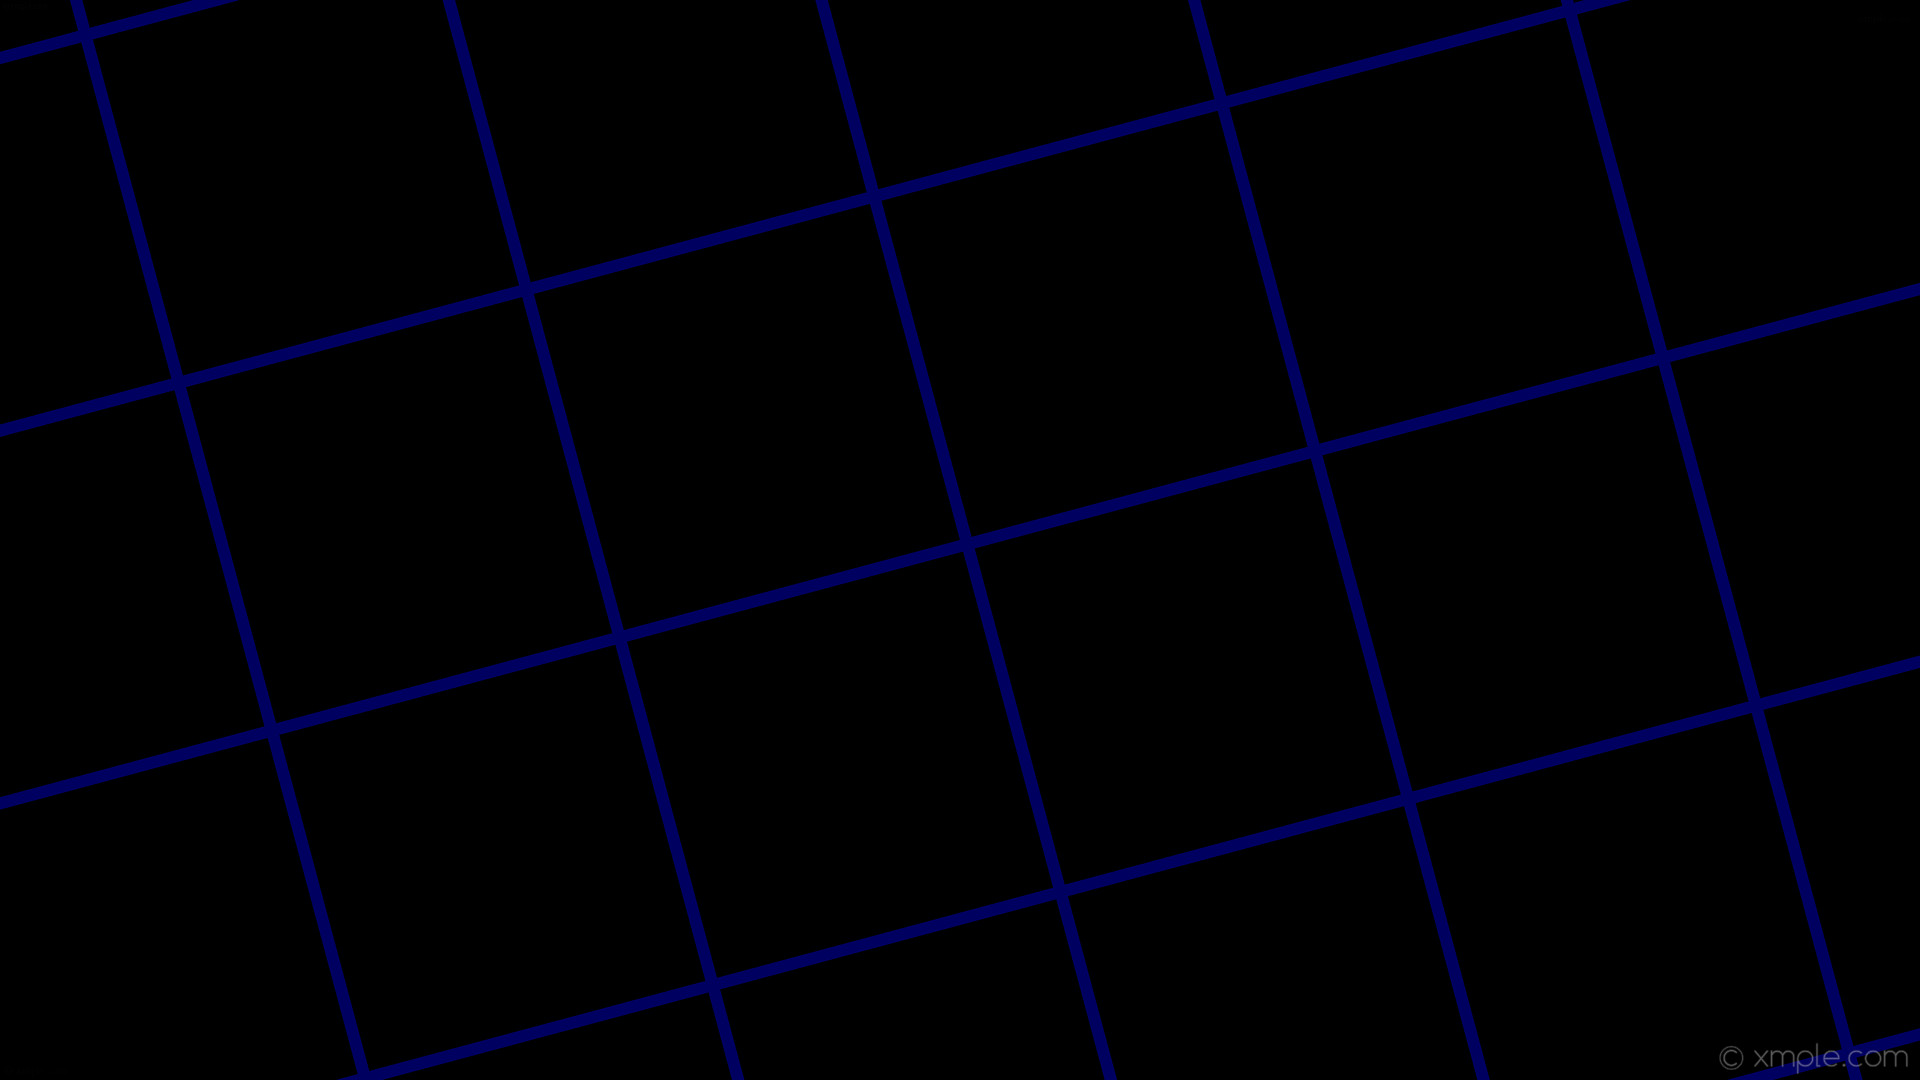 wallpaper graph paper blue black grid dark blue #000000 #00008b 15° 12px  360px